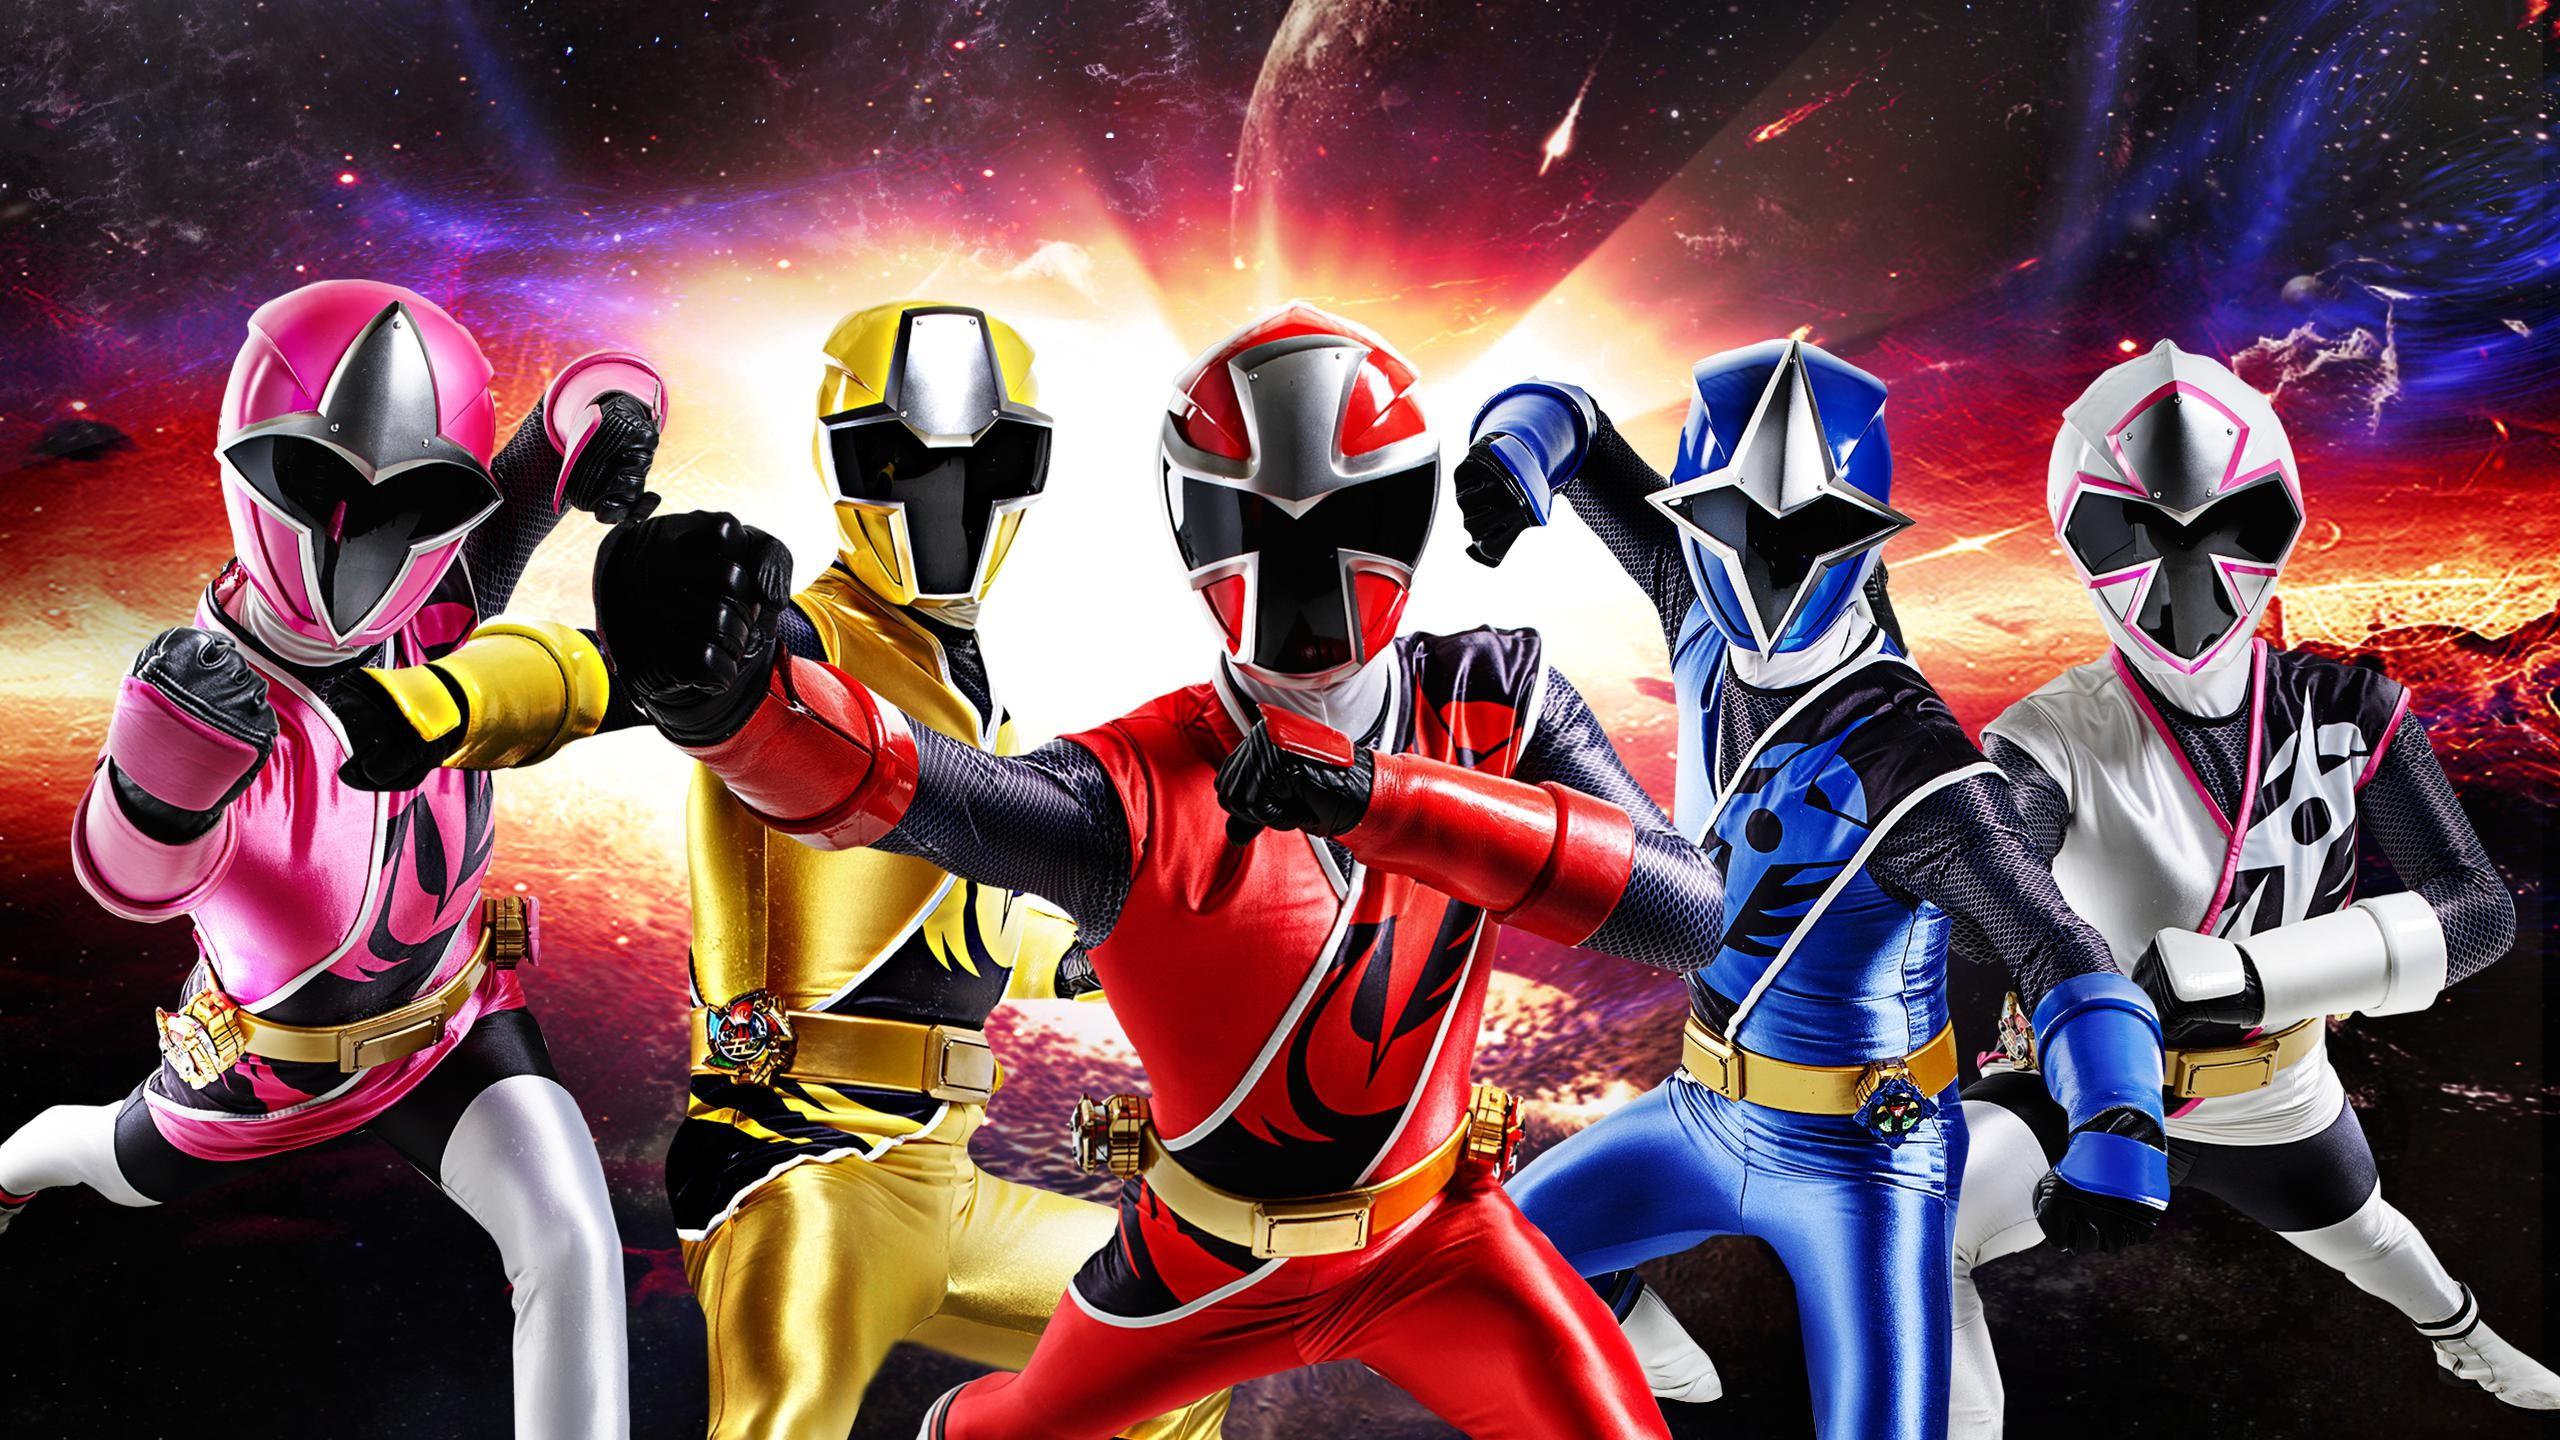 Power Rangers Ninja Steel with Summer Cove High BG by .